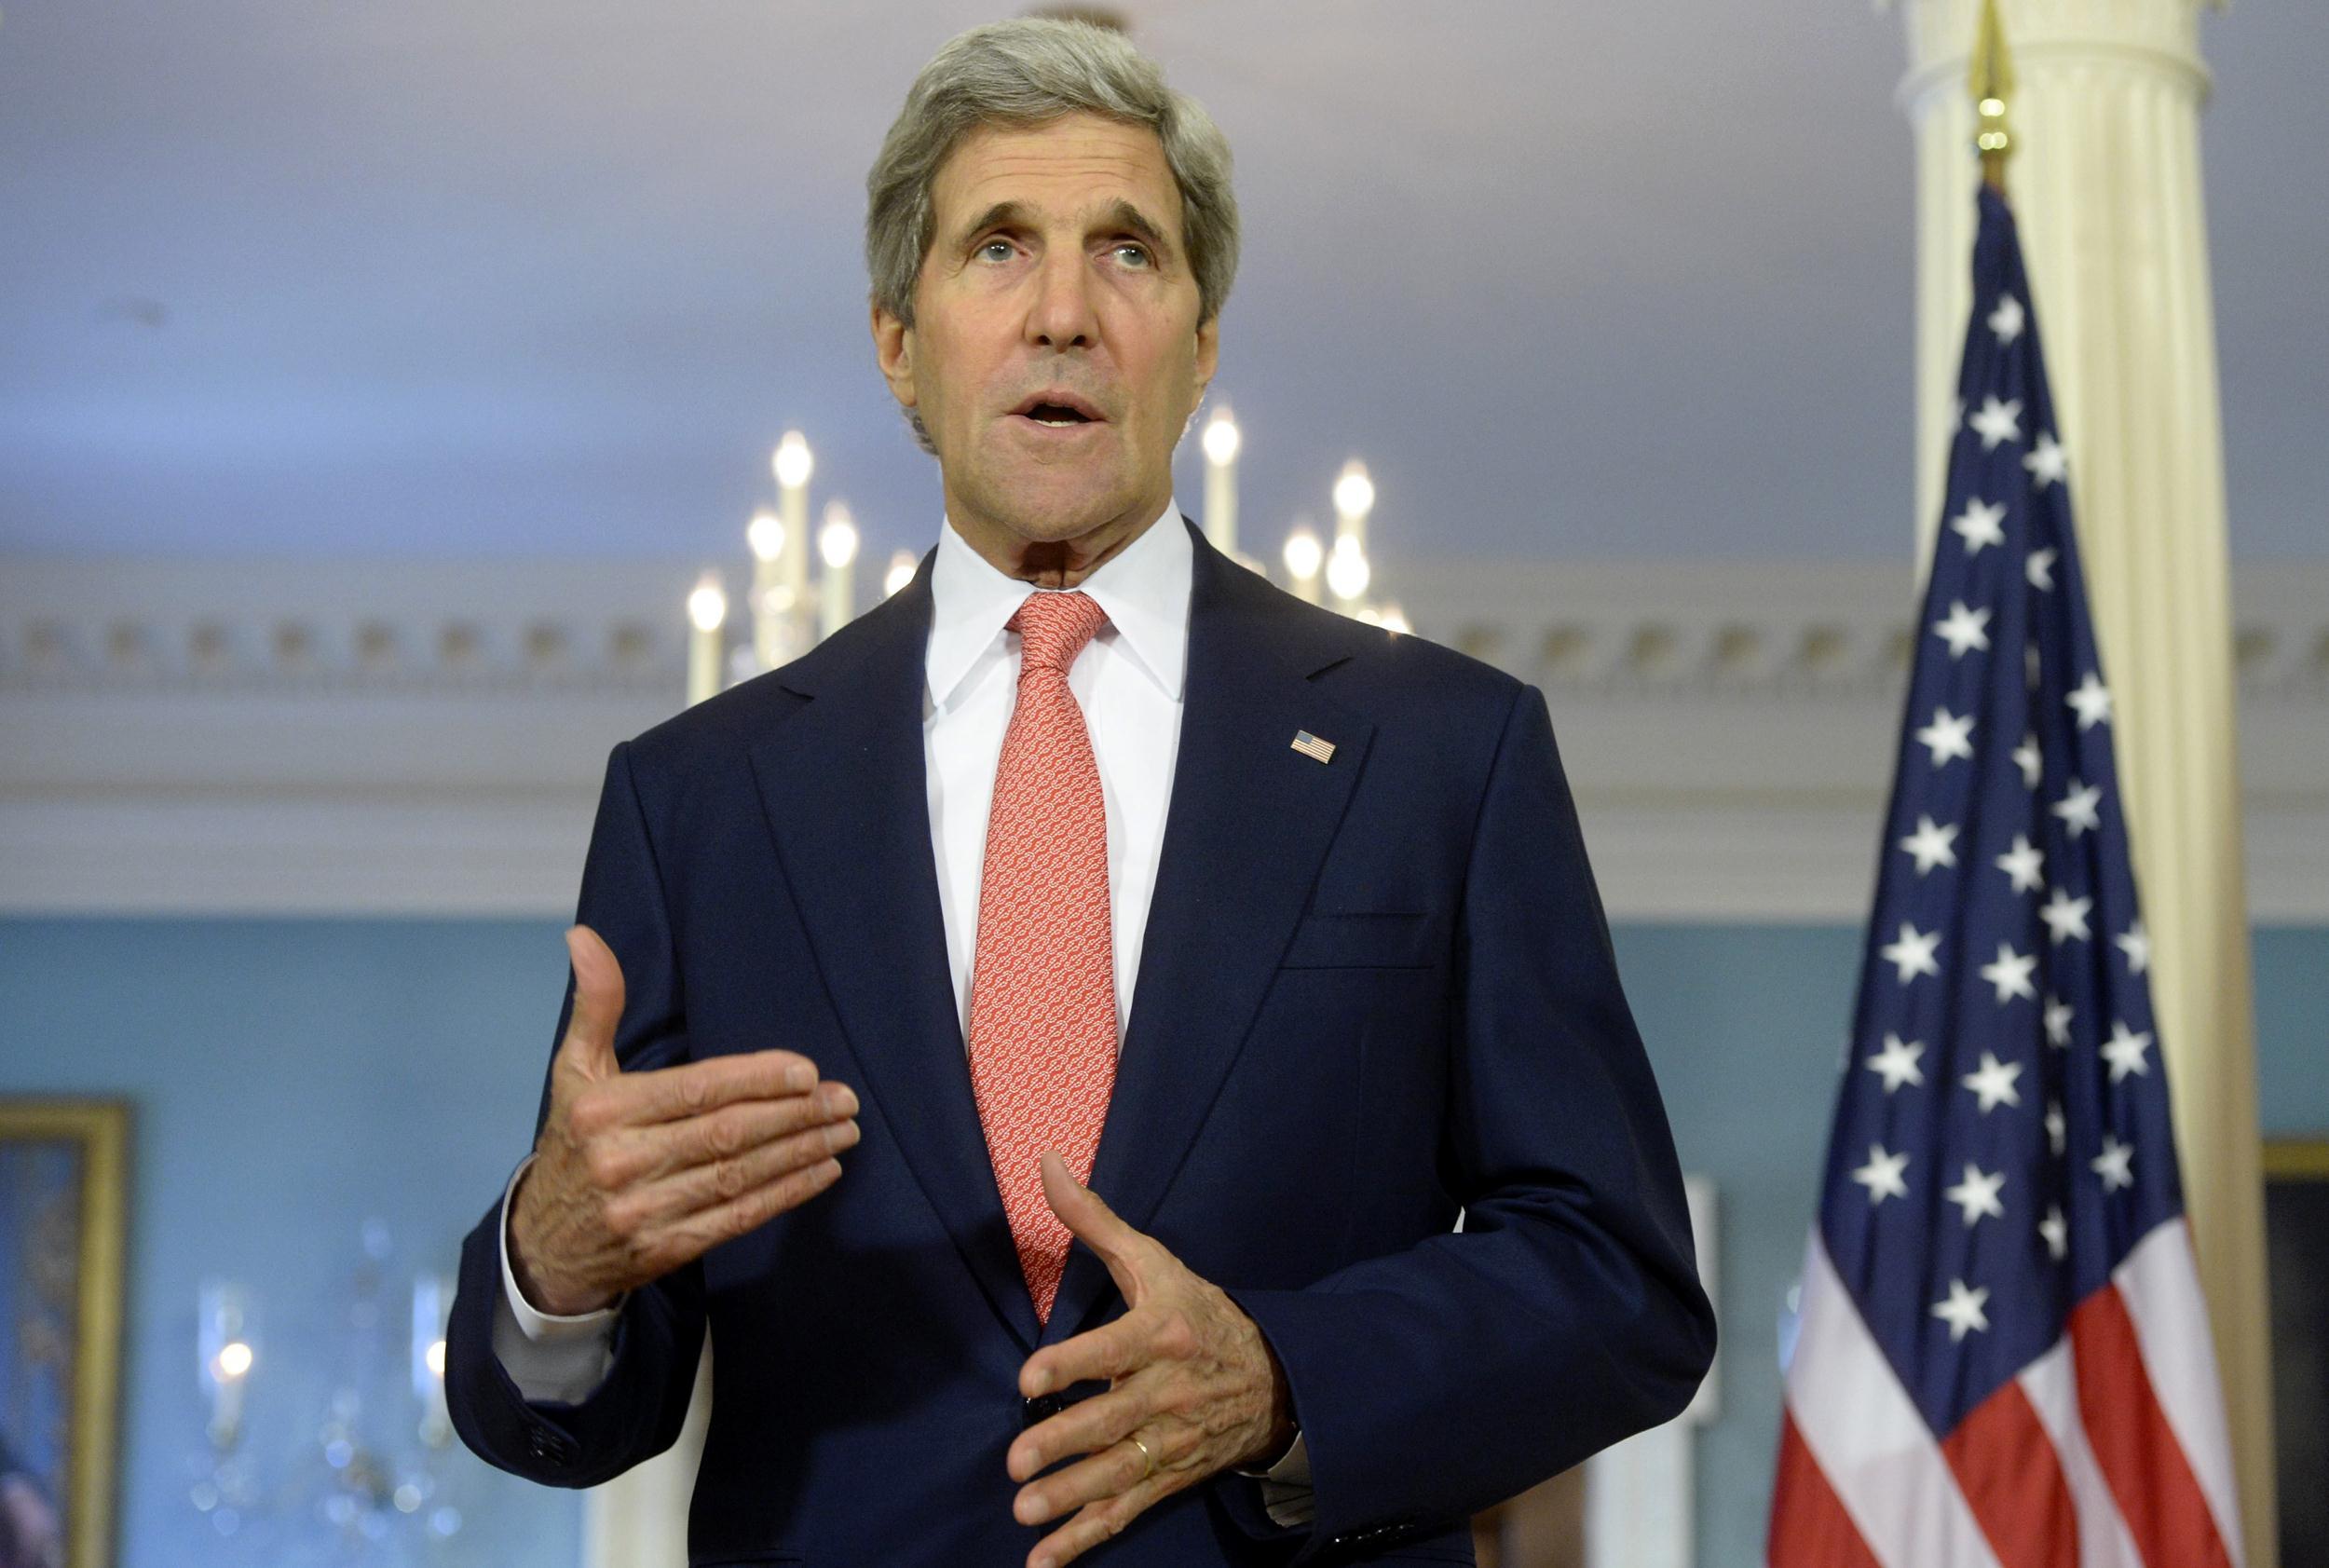 Image: Secretary of State John Kerry